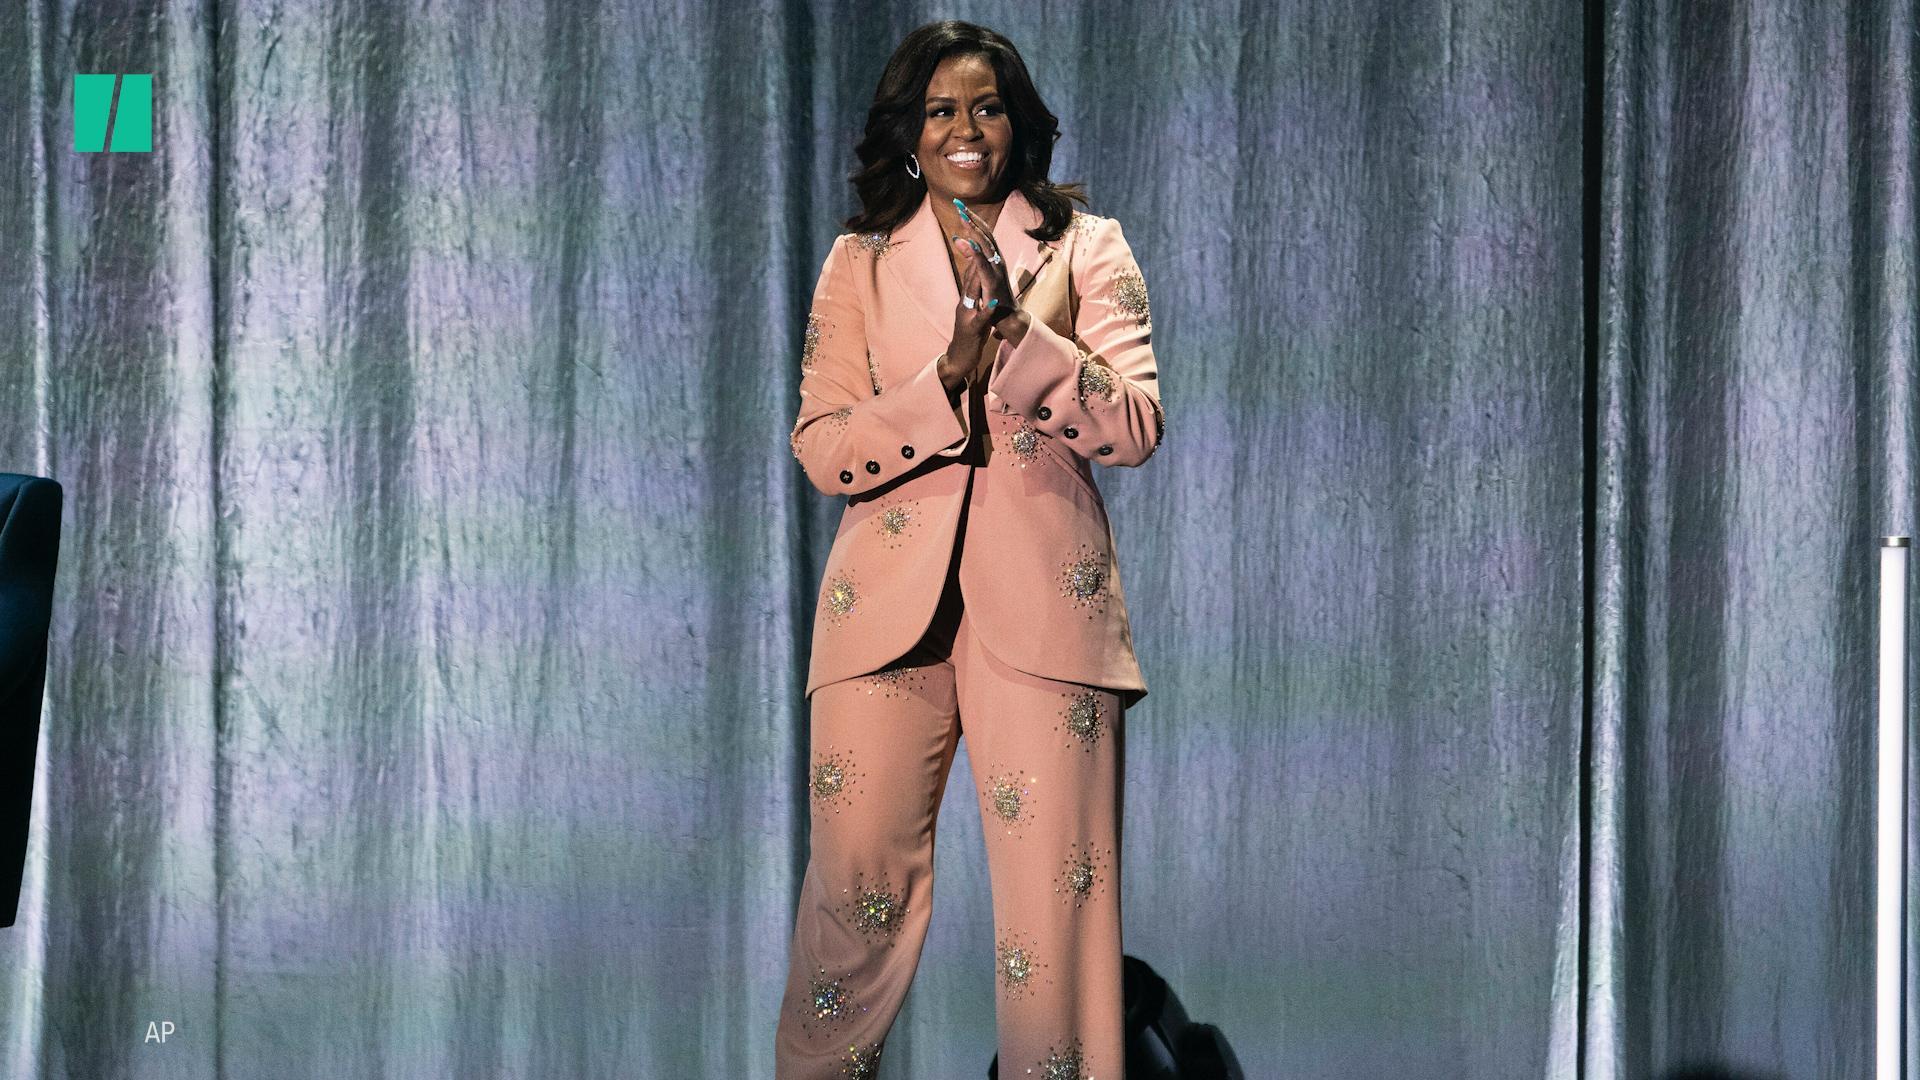 Michelle Obama's complete style transformation